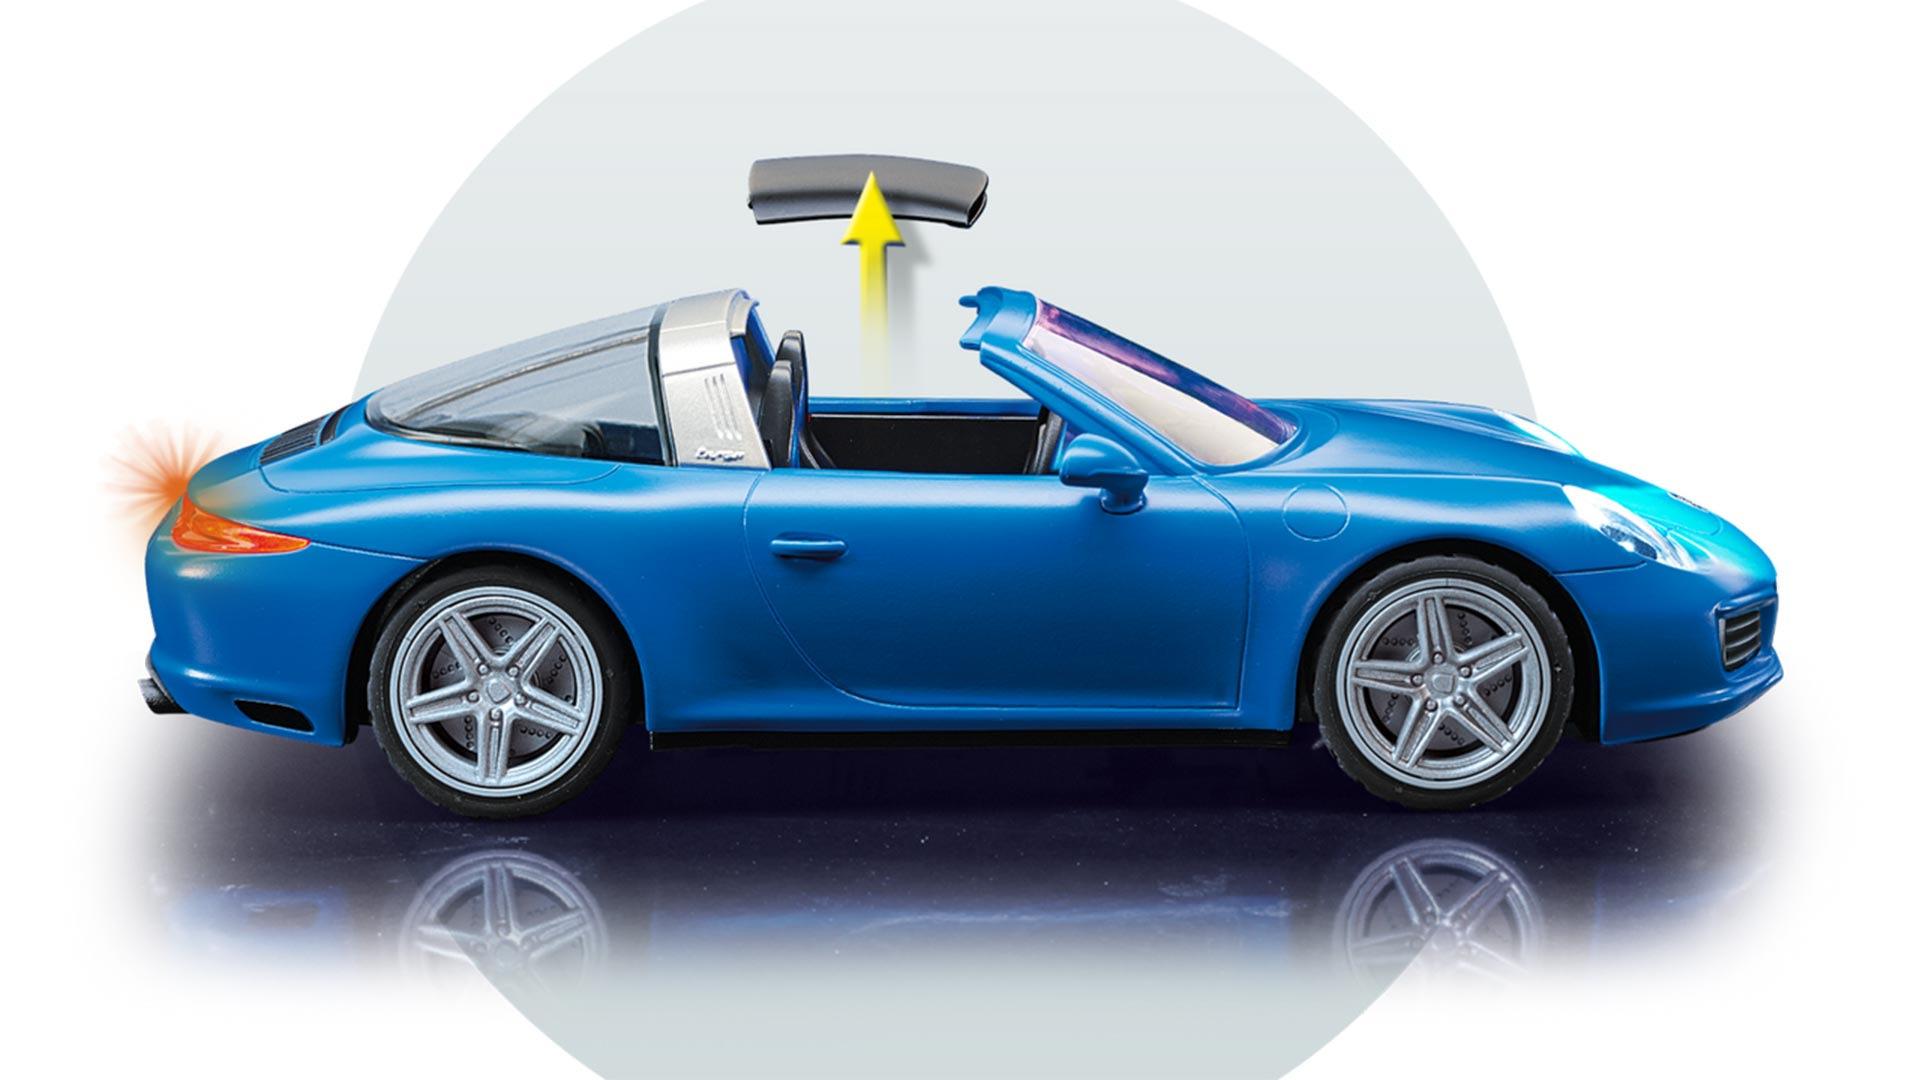 playmobil-porsche-911-targa-4s (3)